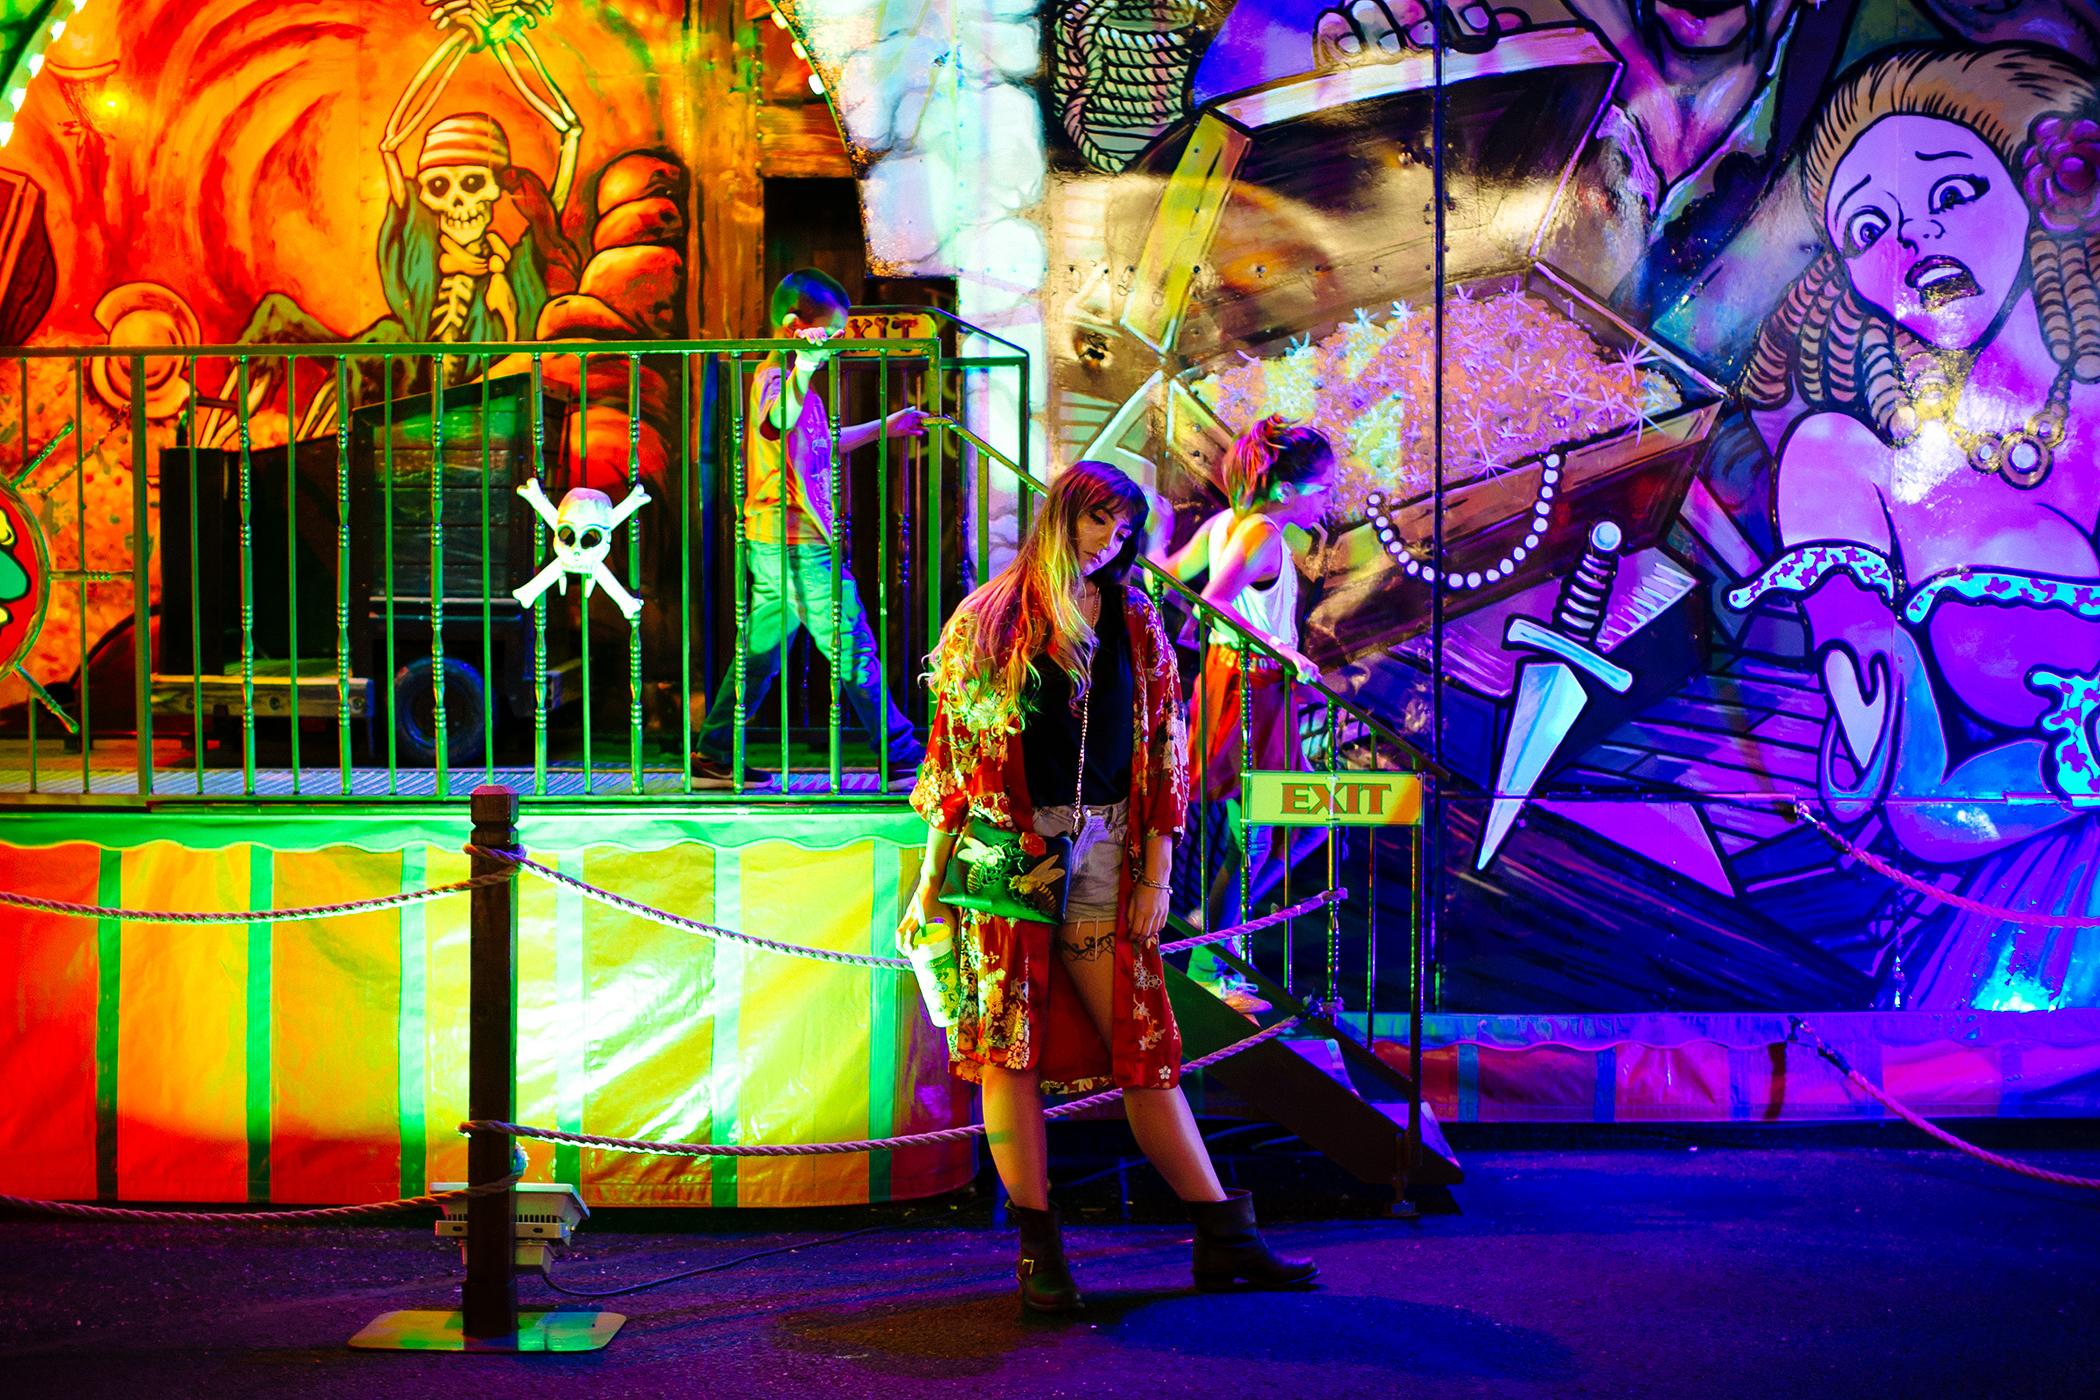 cheyenne frontier days carnival alyssa grace edwards liz osban photography wyoming fair ferris wheel